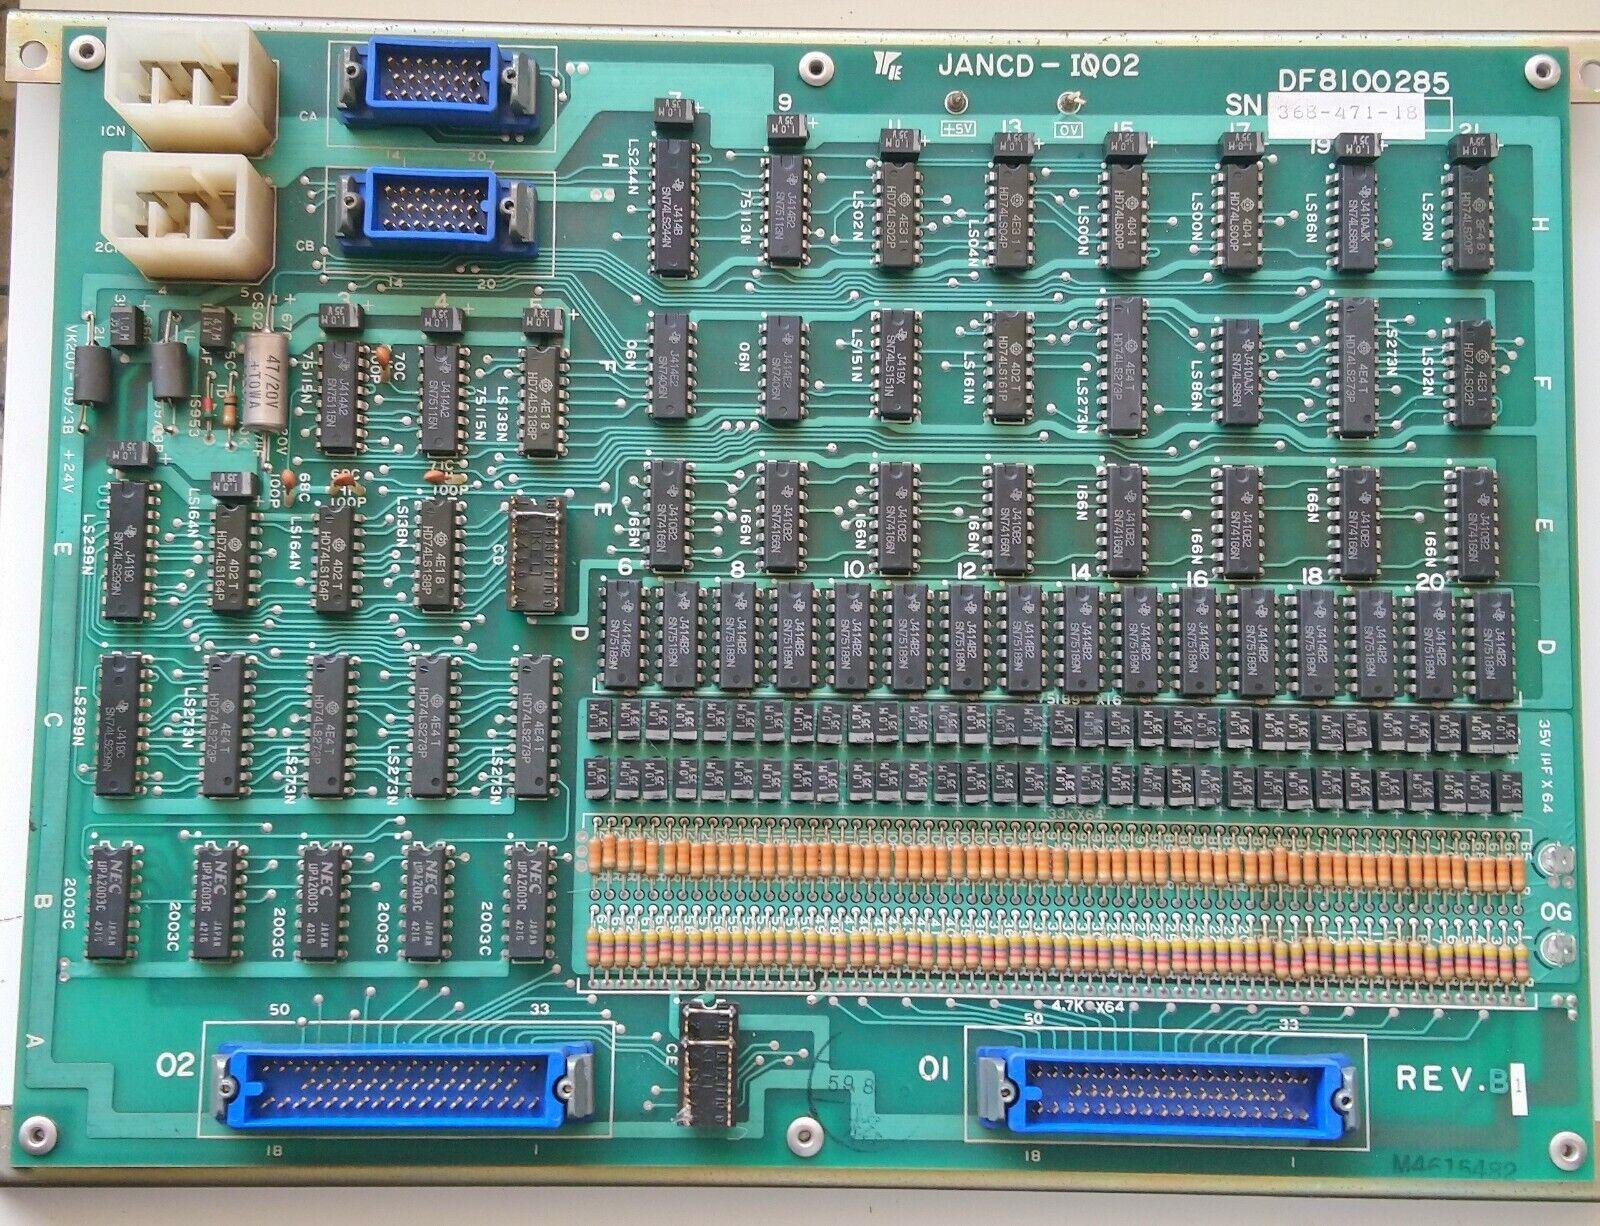 YASKAWA JANCD-I002 JANCD-IO02 JANCD-I0O2 JANCD-IOO2 DF8100285 REV.B MODULE